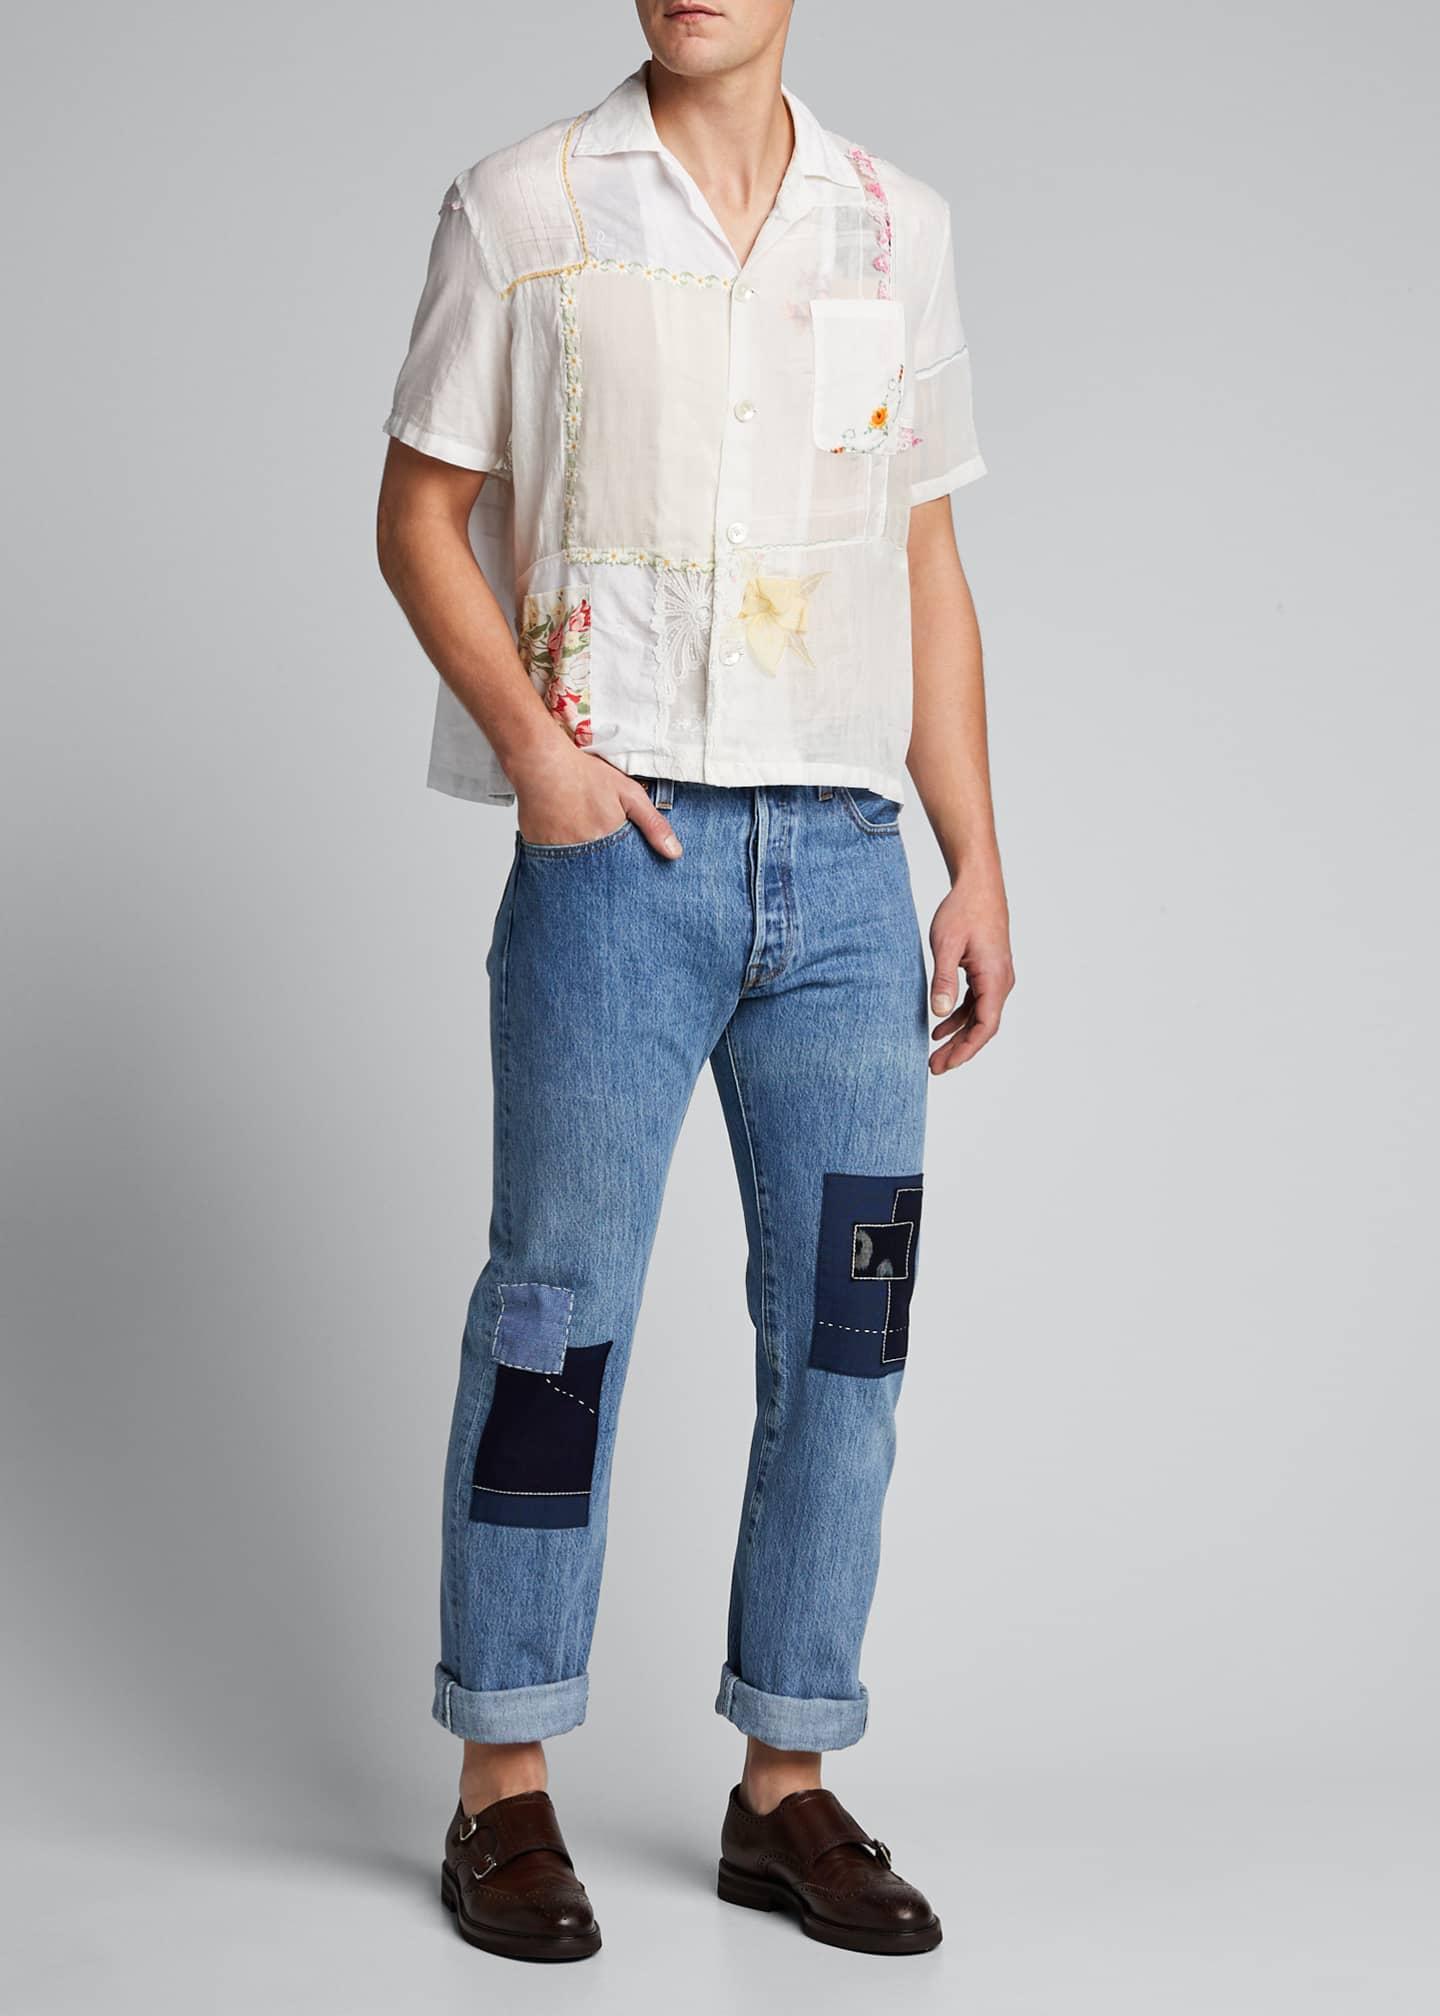 Bode Men's Handkerchief Bowling Shirt